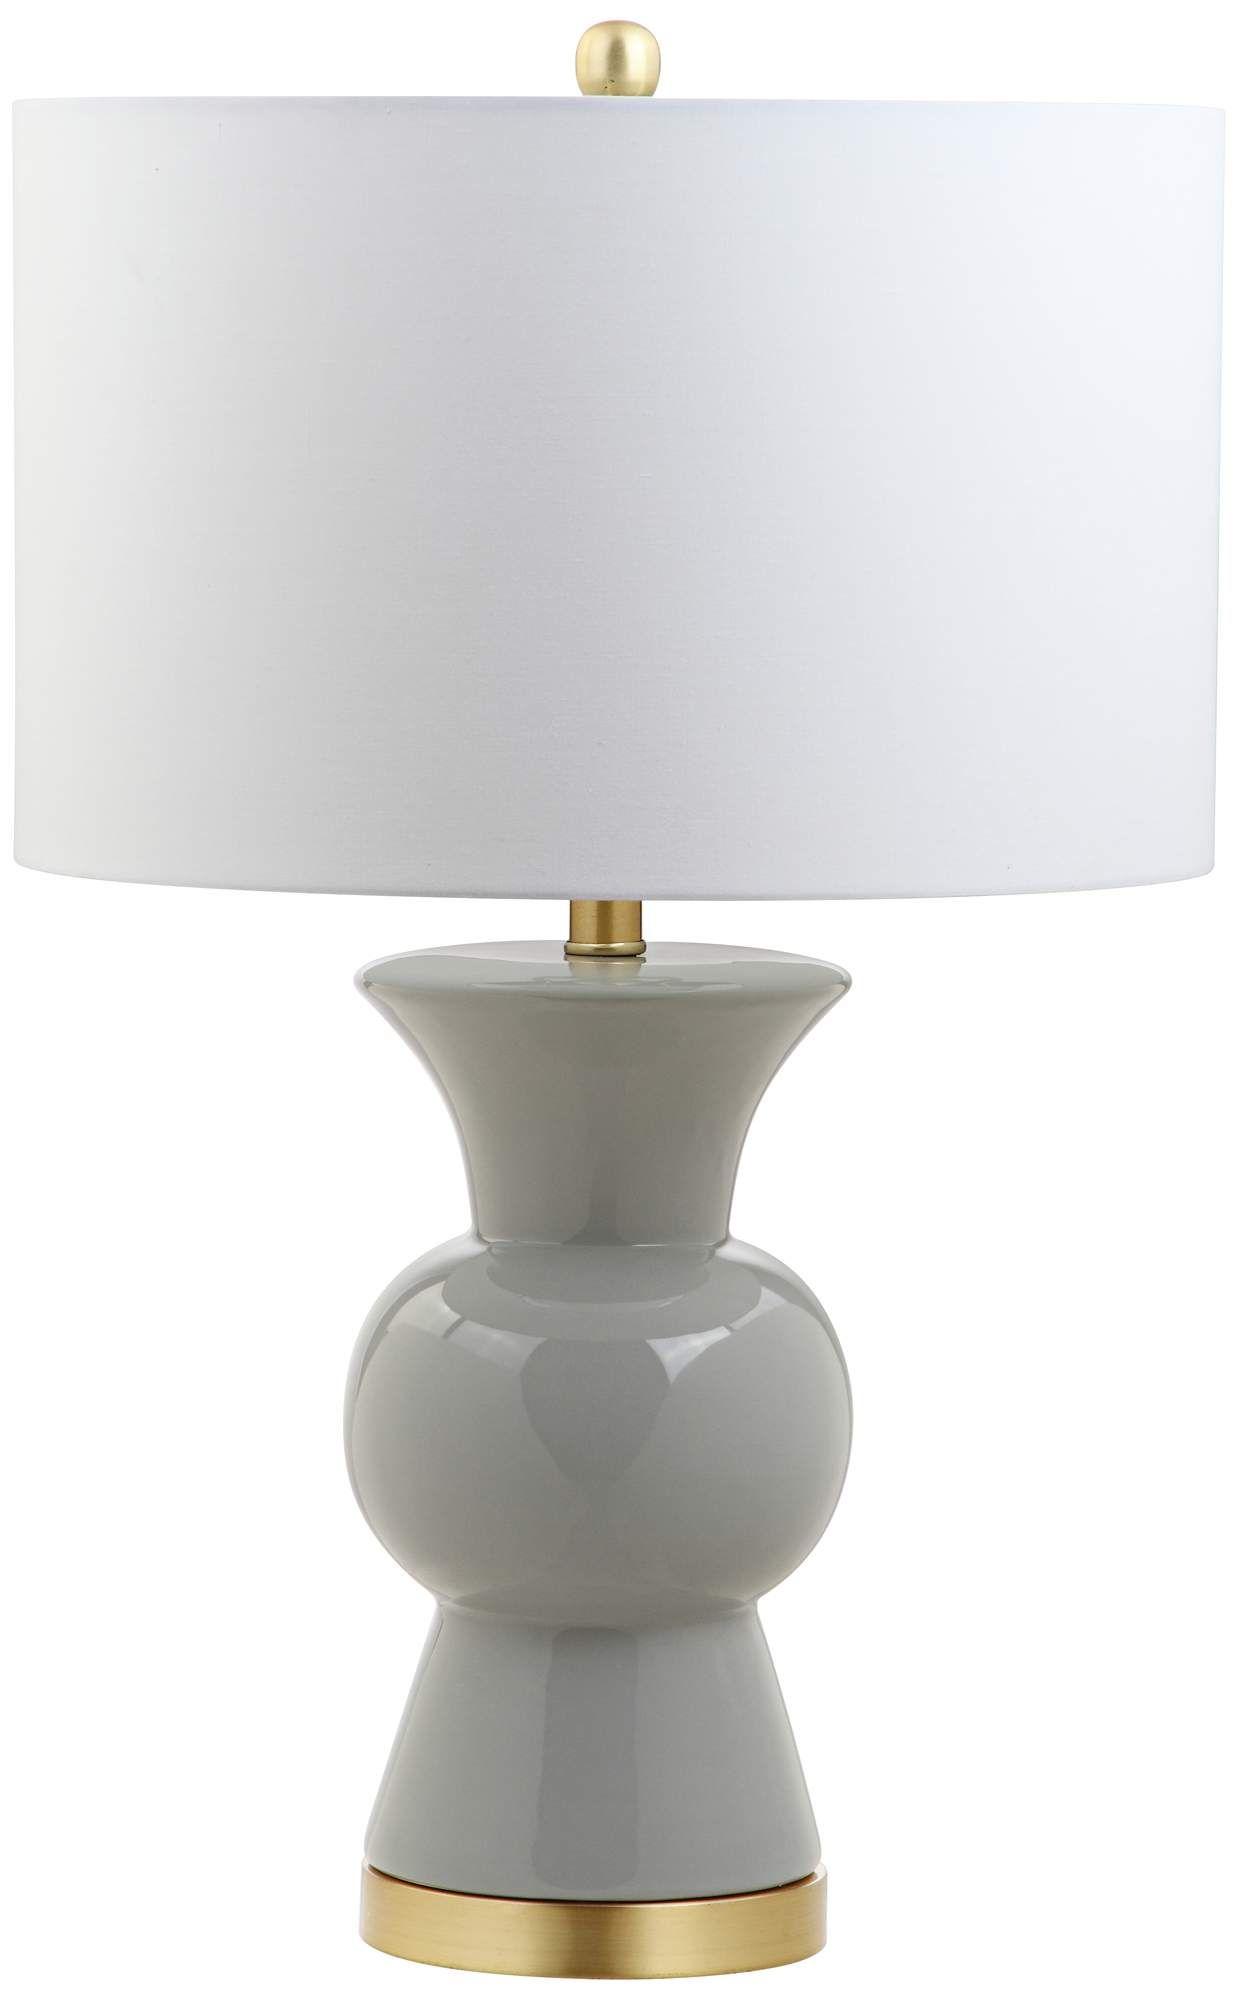 Table Lamps Eden Gray Ceramic Table Lamp In 2020 Ceramic Table Lamps Table Lamp Lamp